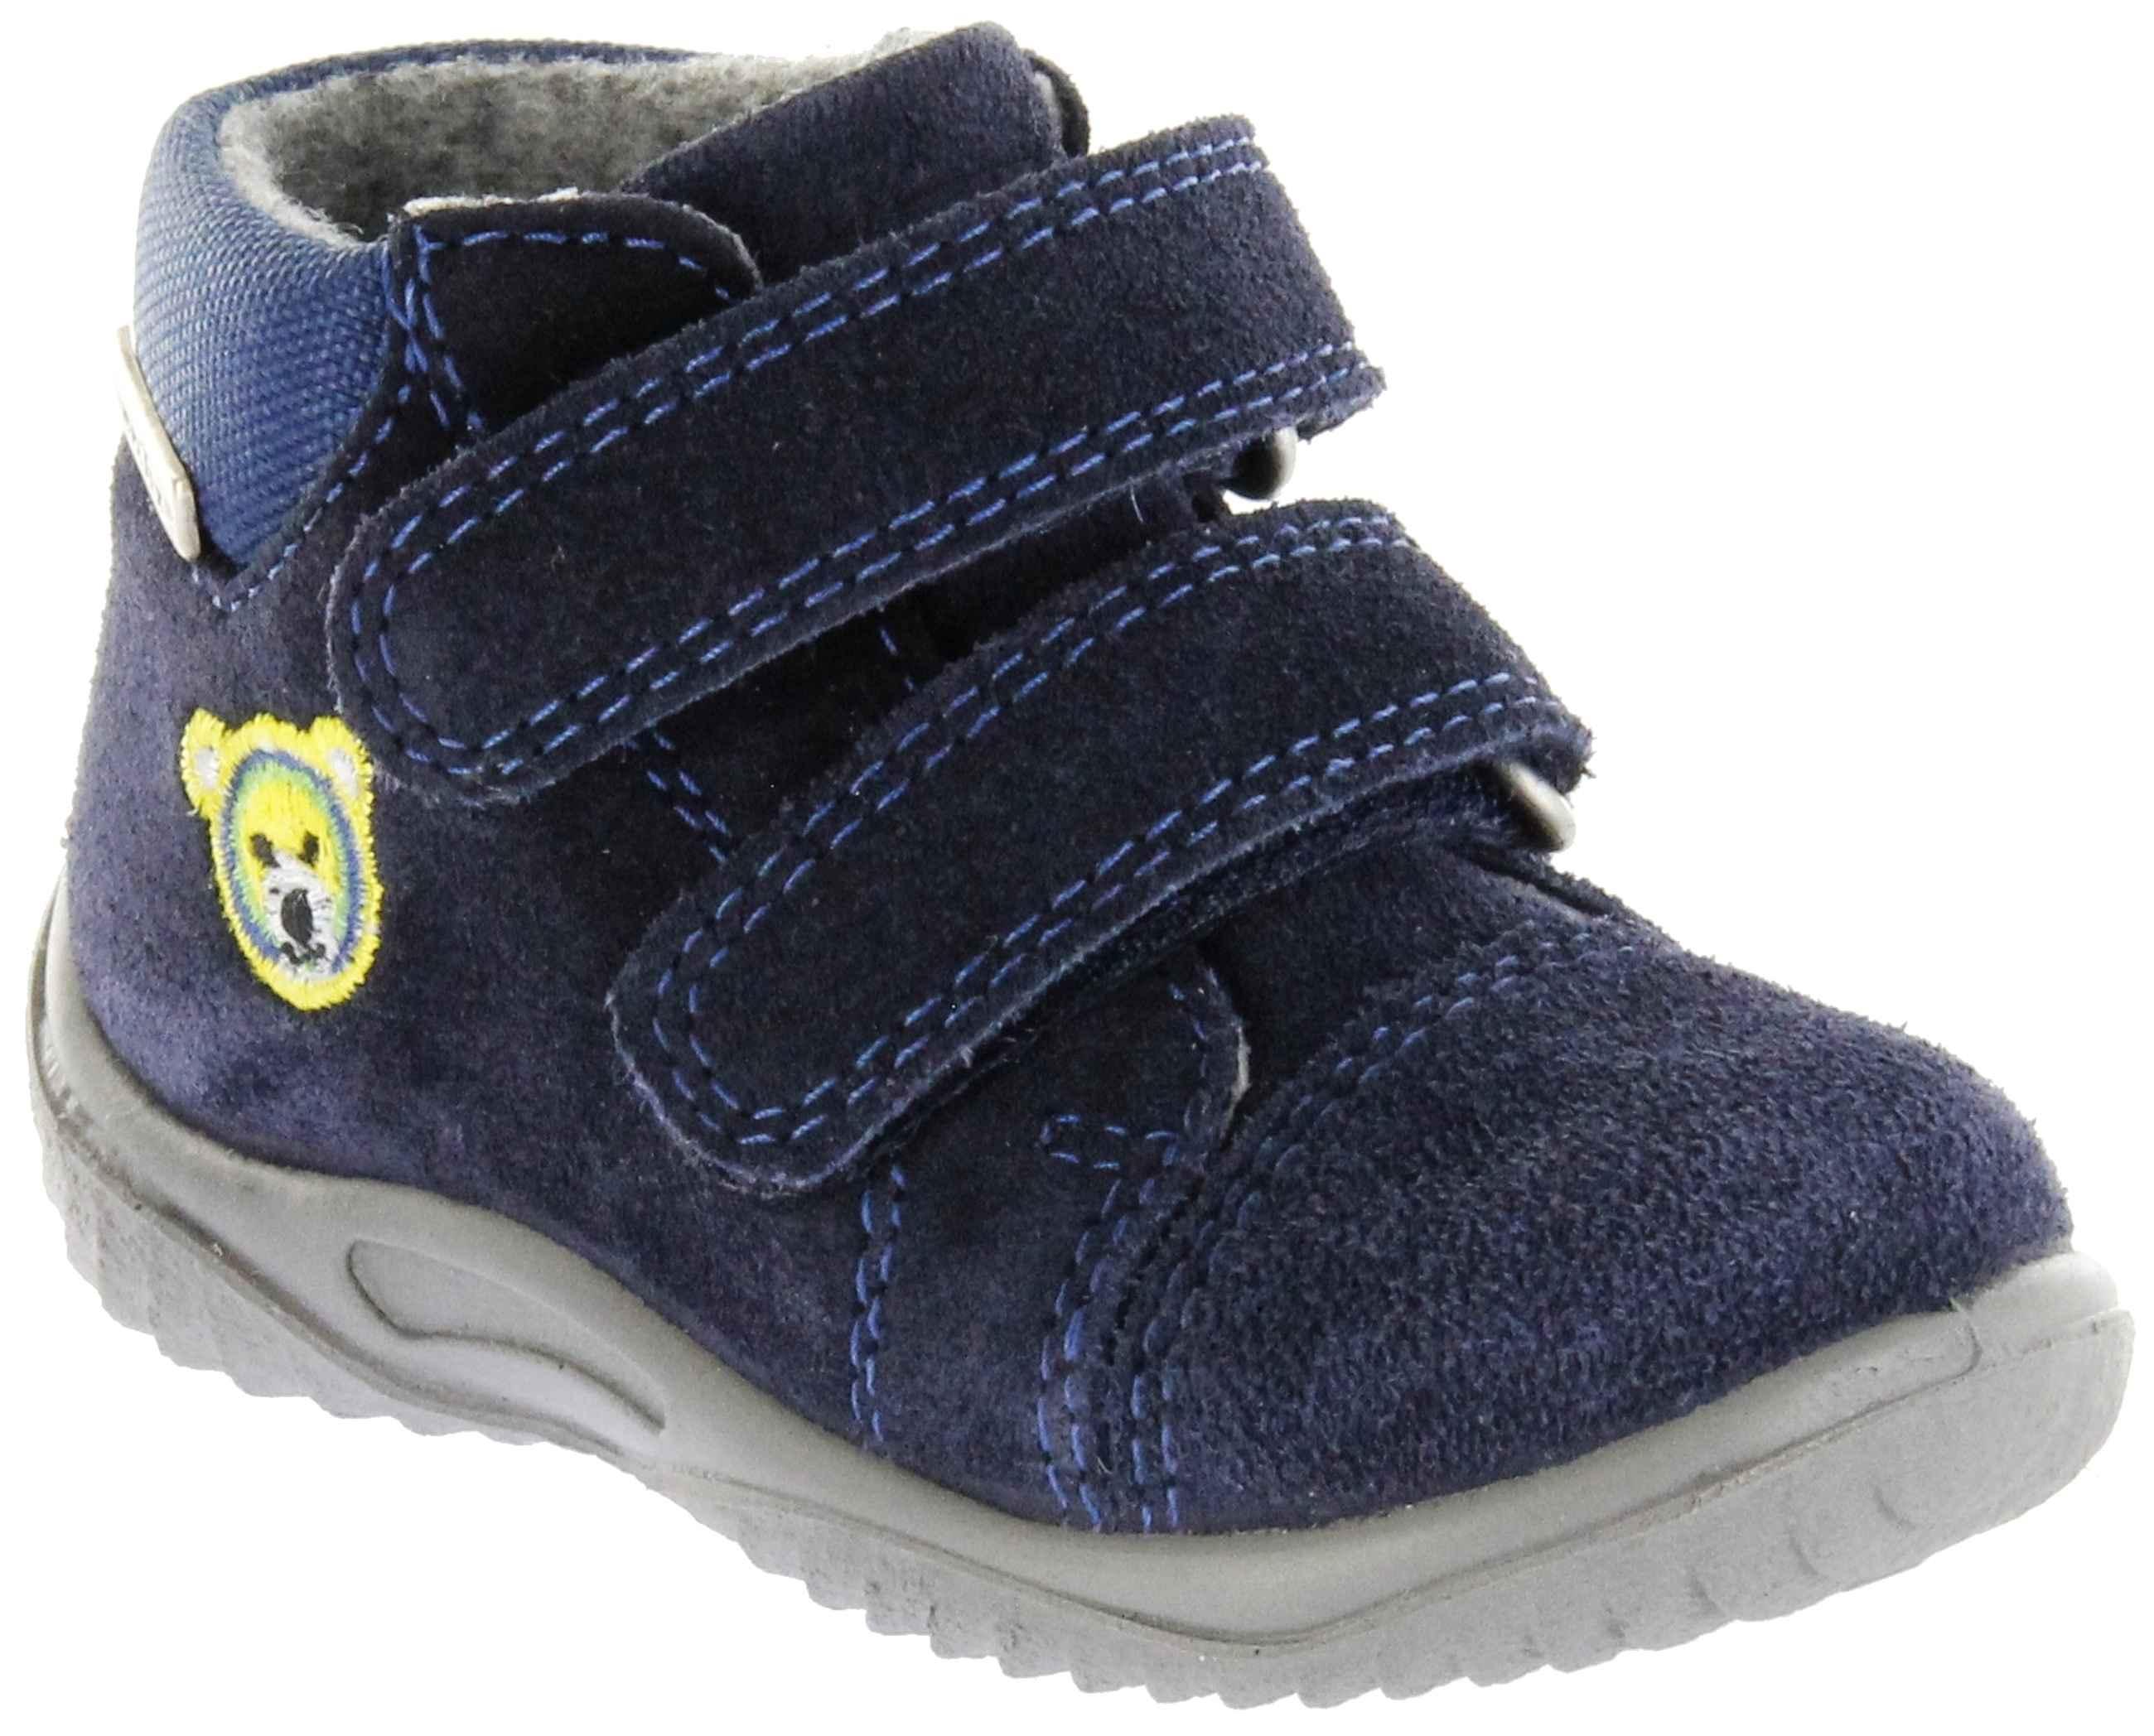 Richter Kinder Lauflerner blau Velourleder Sympatex Jungen Schuhe 1124-242-7201 Atlantic Info S